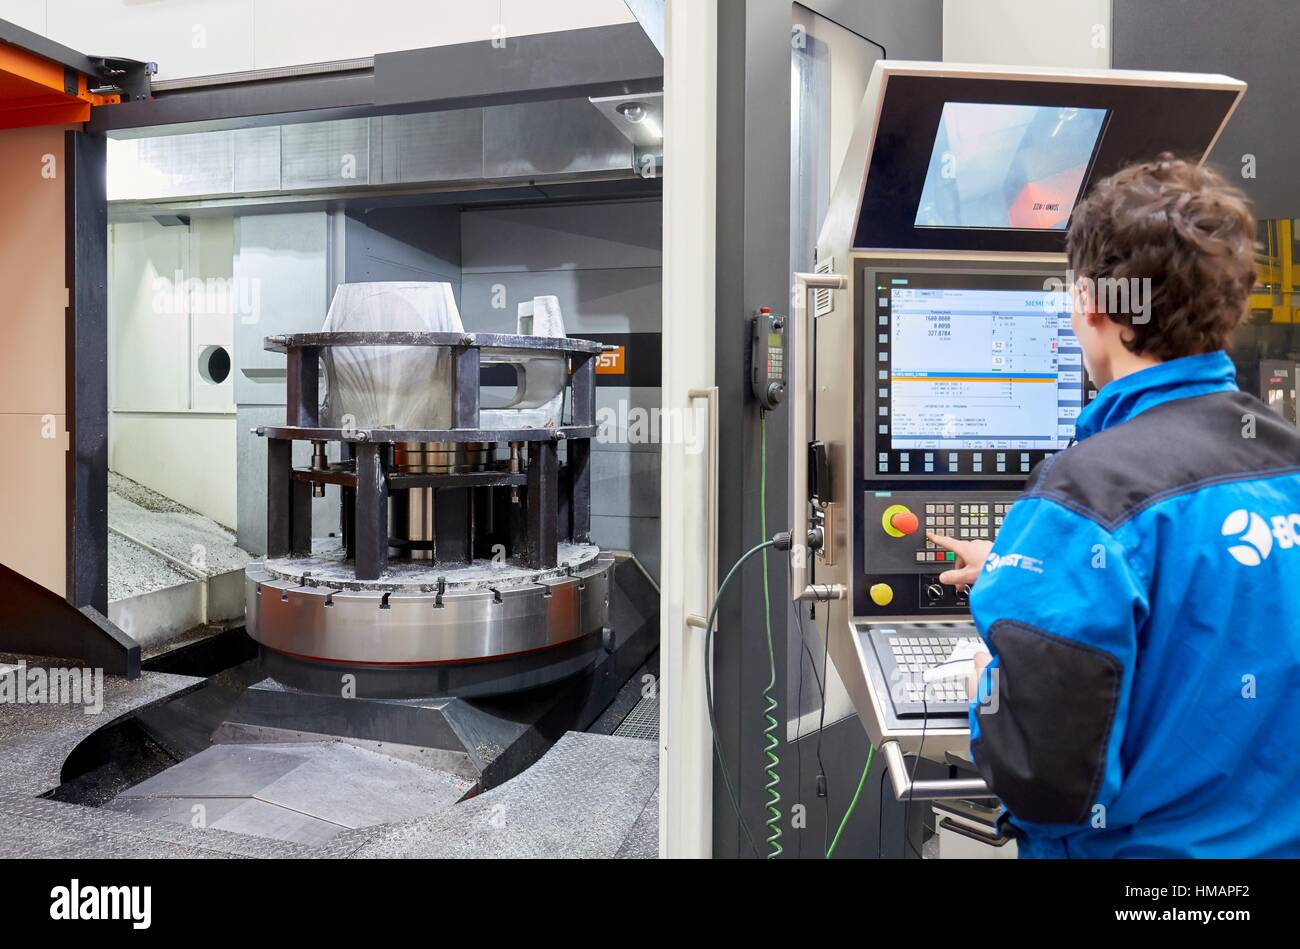 Machining Center. CNC. Vertical lathe. Machine Tools Company. Gipuzkoa. Basque Country. Spain. Europe - Stock Image